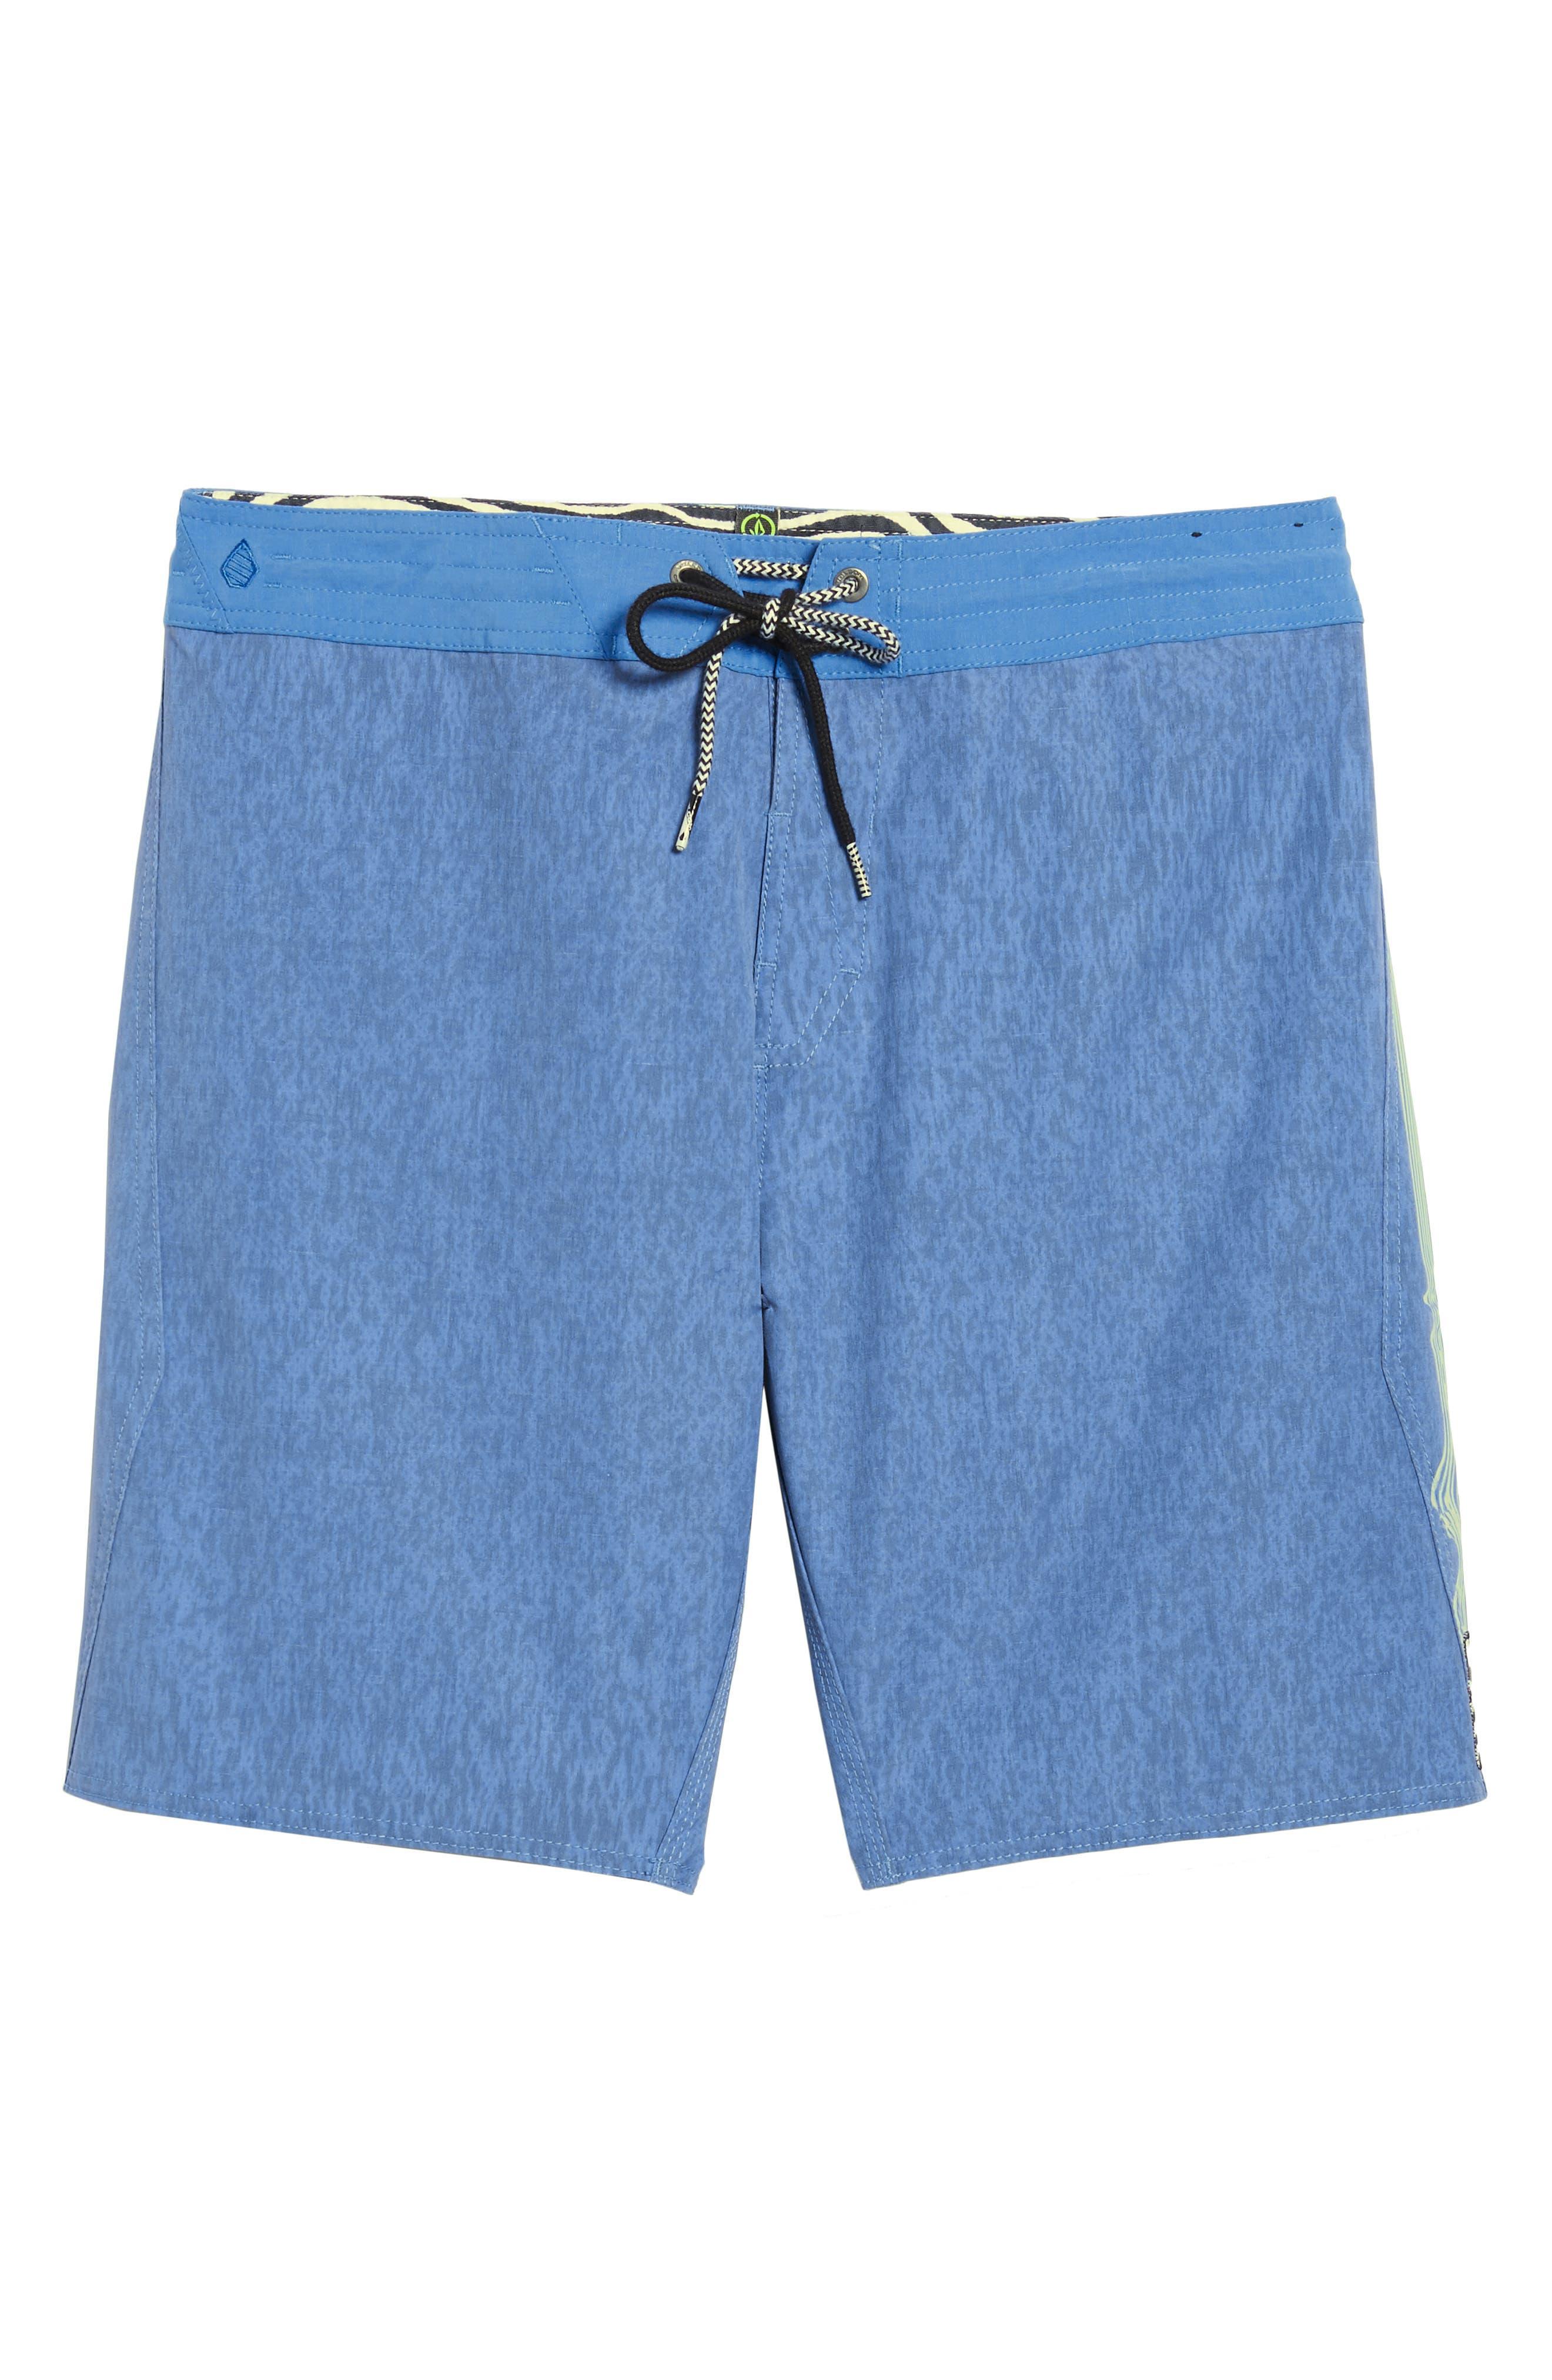 Side Fi Stoney Board Shorts,                             Alternate thumbnail 6, color,                             Blue Free